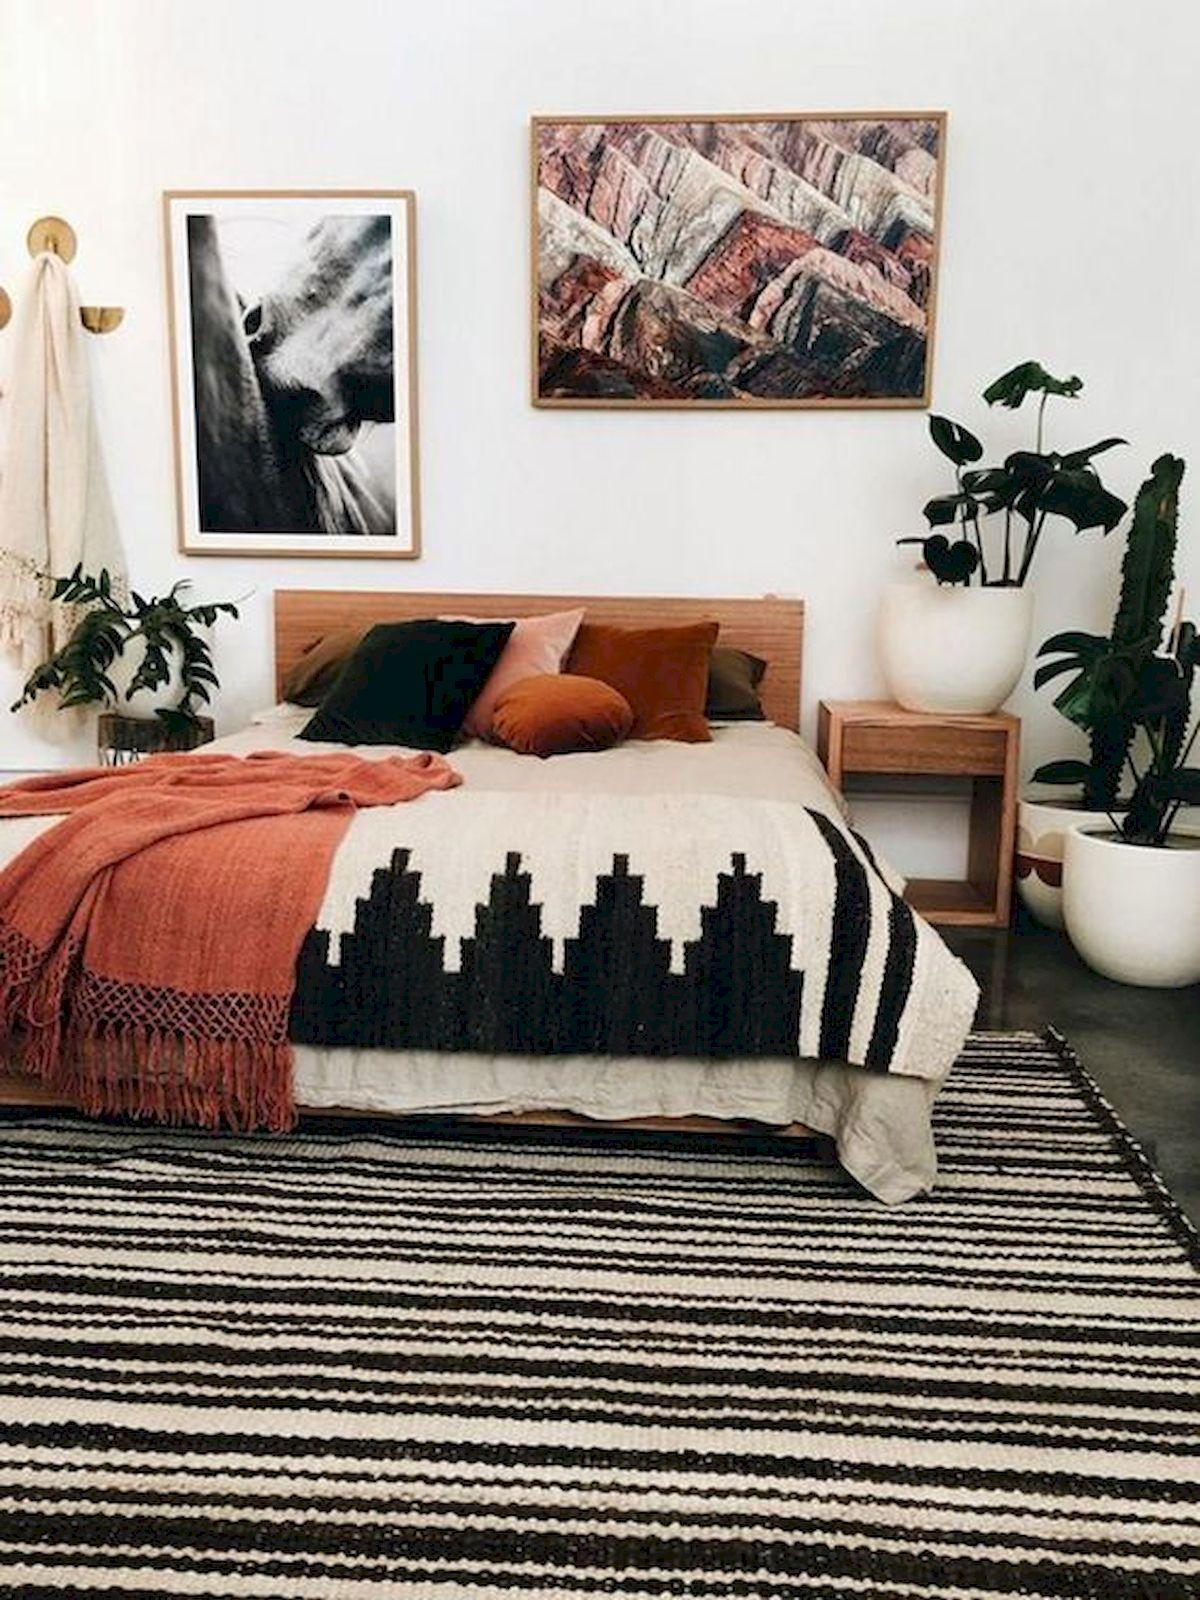 40 Fantastic DIY Decor Ideas For Farmhouse Boho Bedroom Design (31)